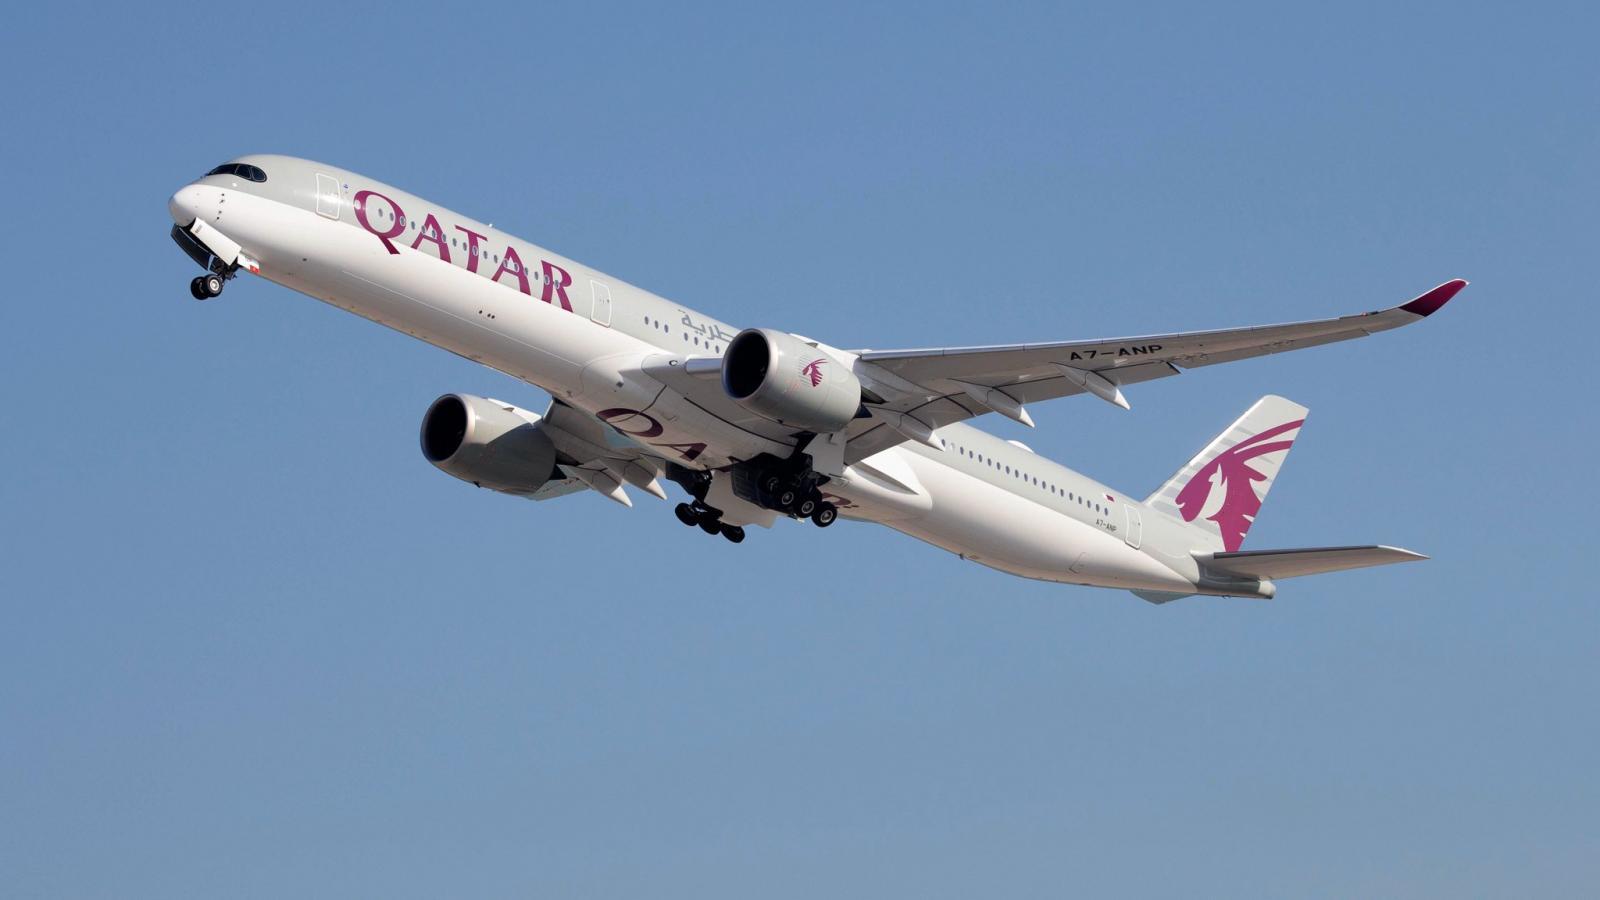 Qatar Airways named world's best airline by eDreams